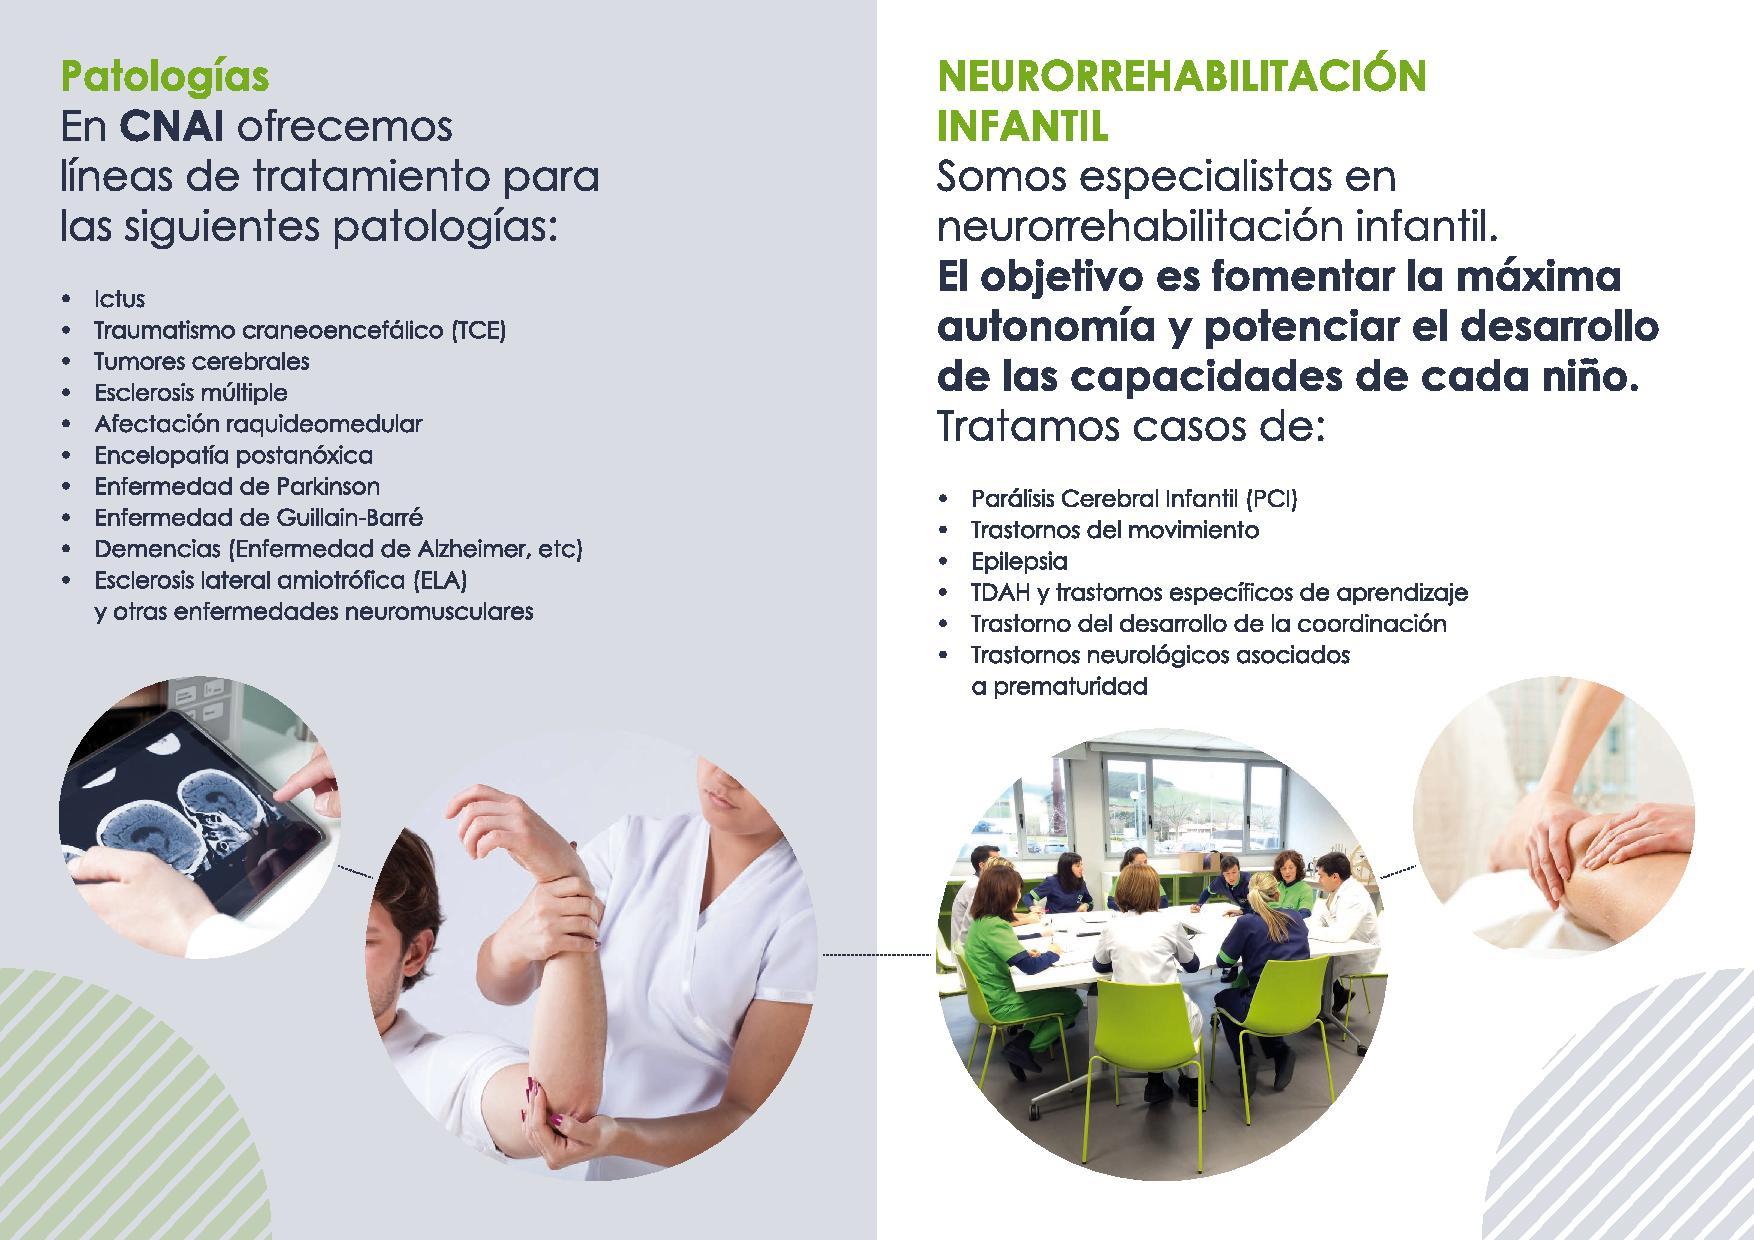 CNAI Presentacion resumida-page-004